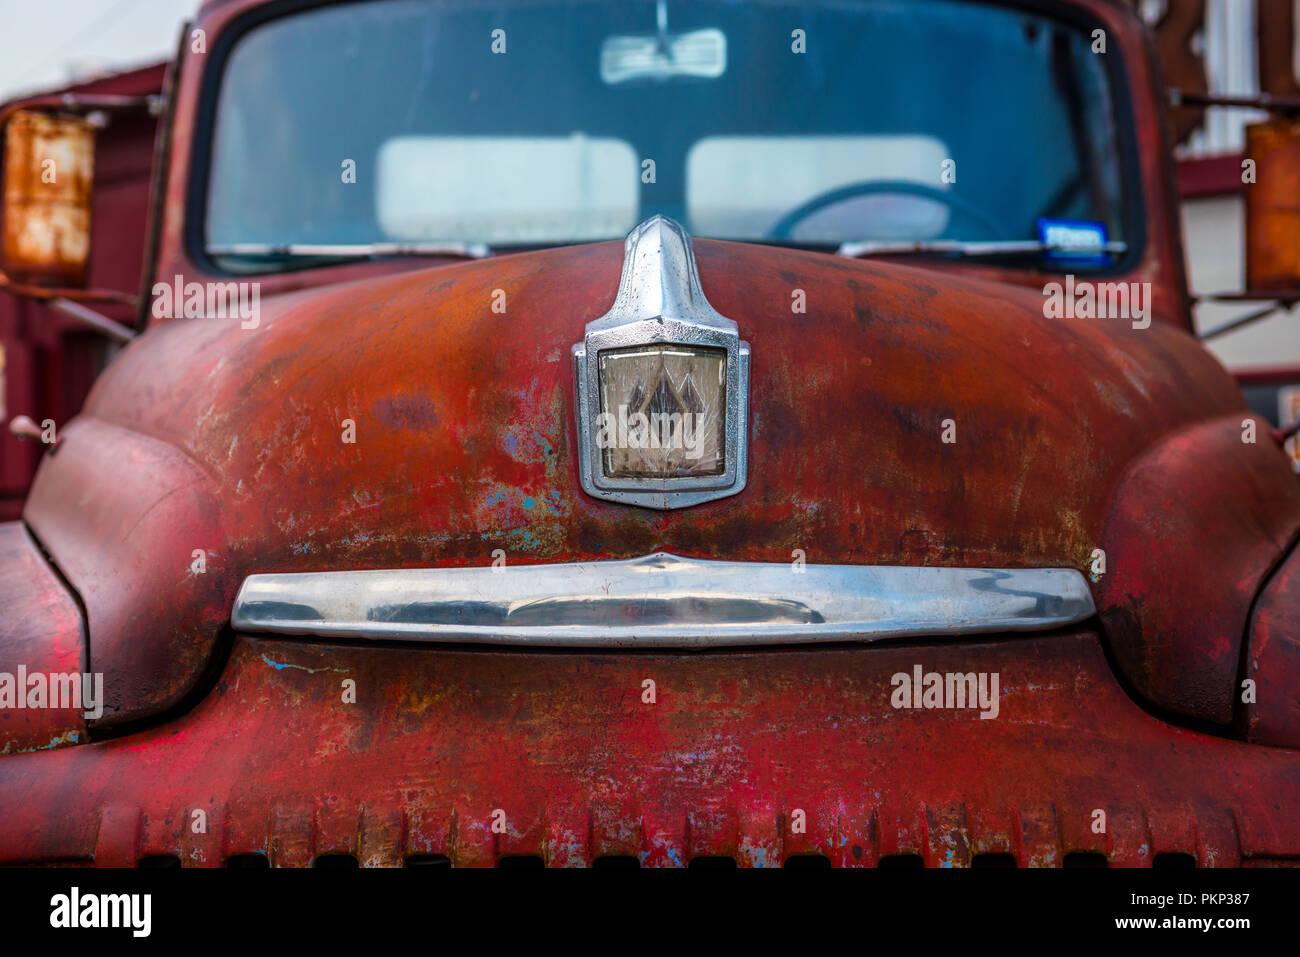 International L-120 camioneta pickup roja en Texas, EE.UU. Foto de stock